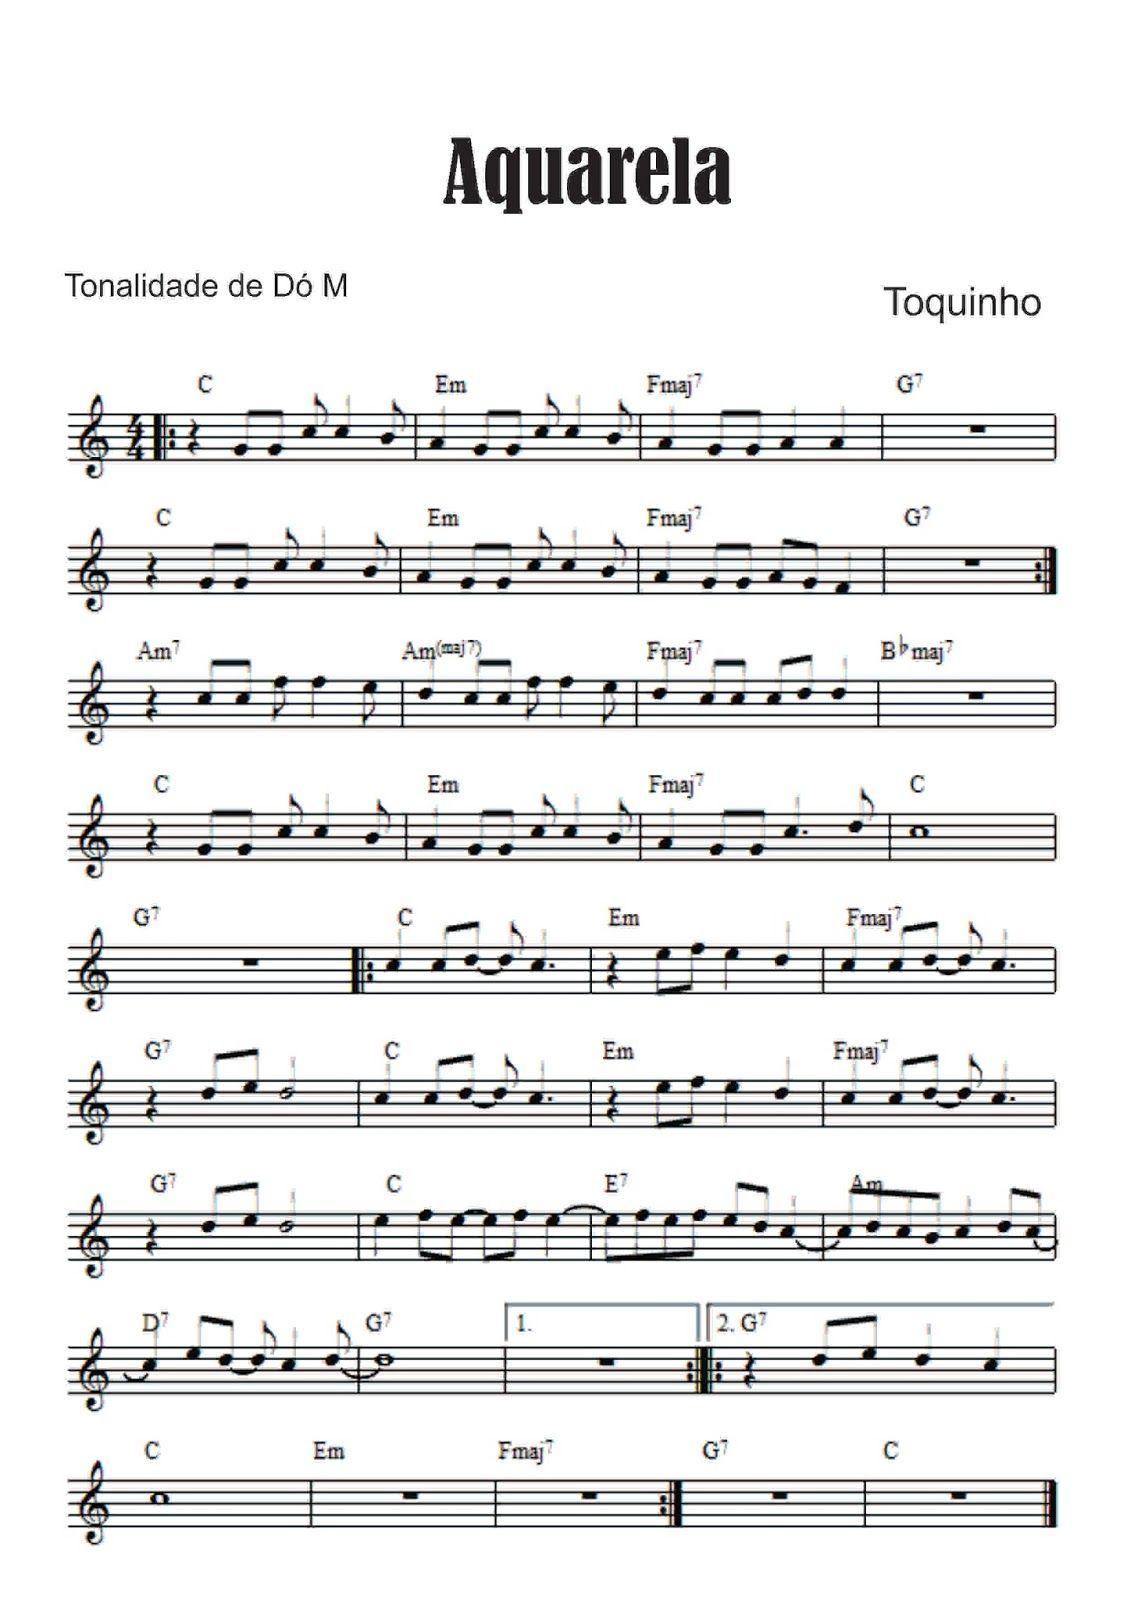 MORAES GRATIS DE AQUARELA DE MUSICA VINICIUS BAIXAR